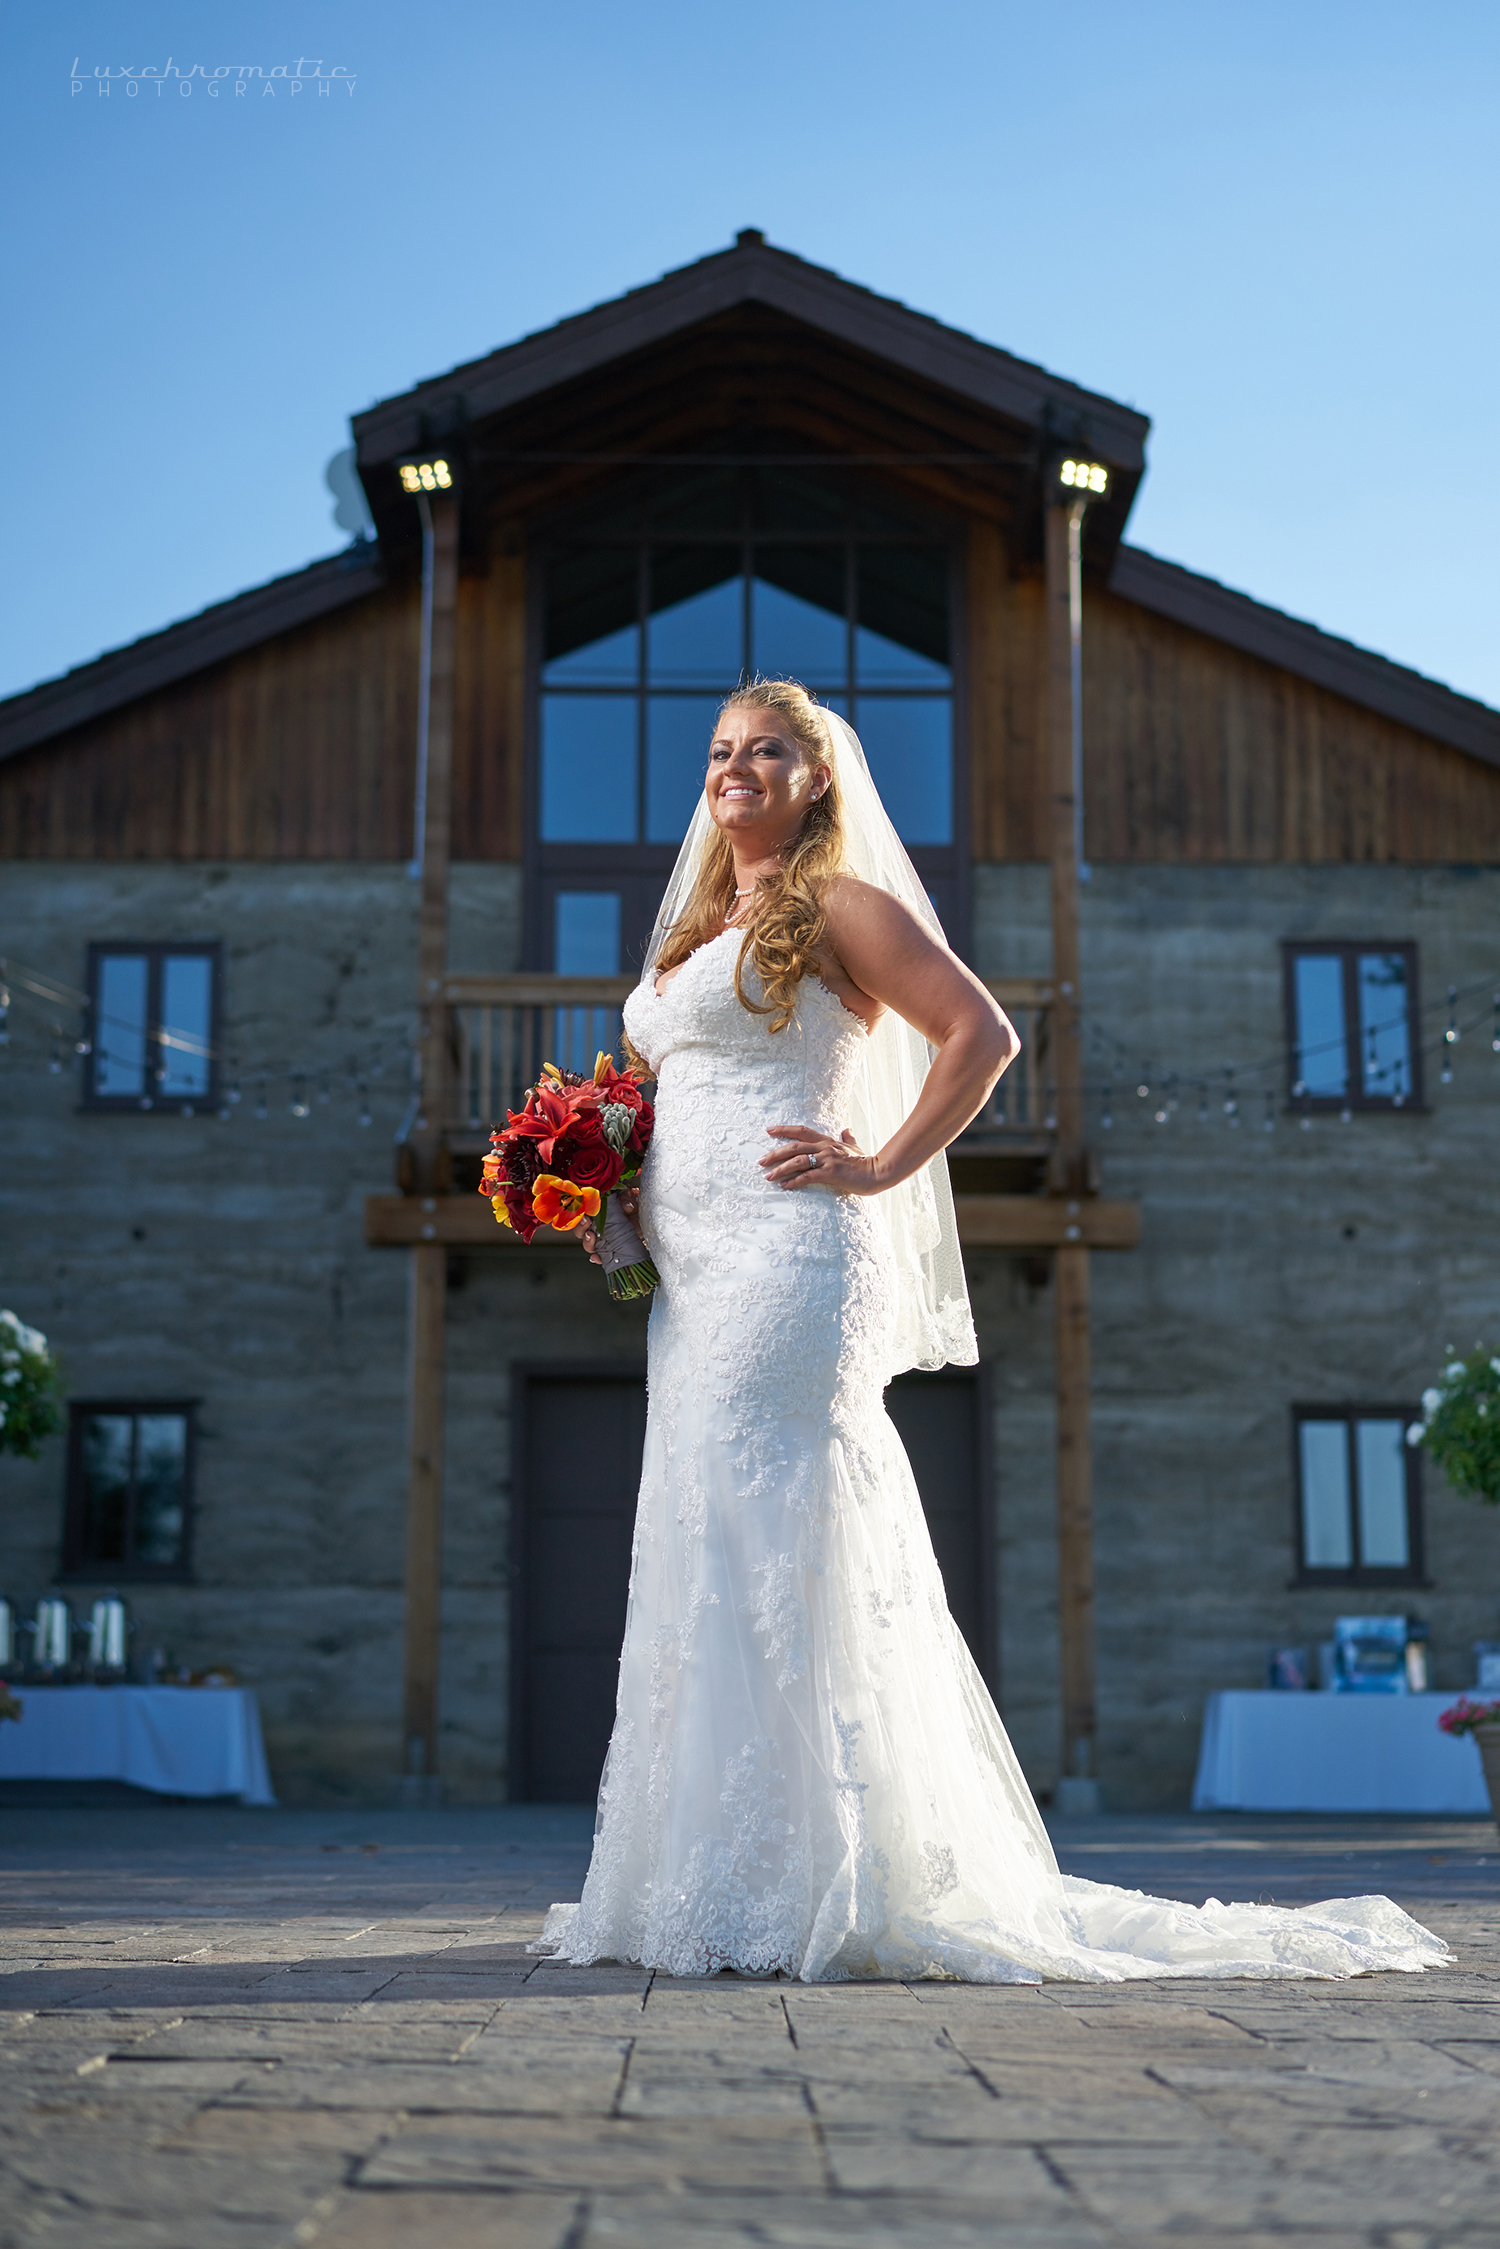 081217_Rachel_Chris_a0580-weddingdress-bride-weddingphotography-weddingphotographer-bridal-groom-wedding-engagementring-proposal-brides-diamondring-sonyalpha-sony-sonya9-sonya7rii-sanfrancisco-sf-bayarea-photographer-profoto-murrietas-well.jpg